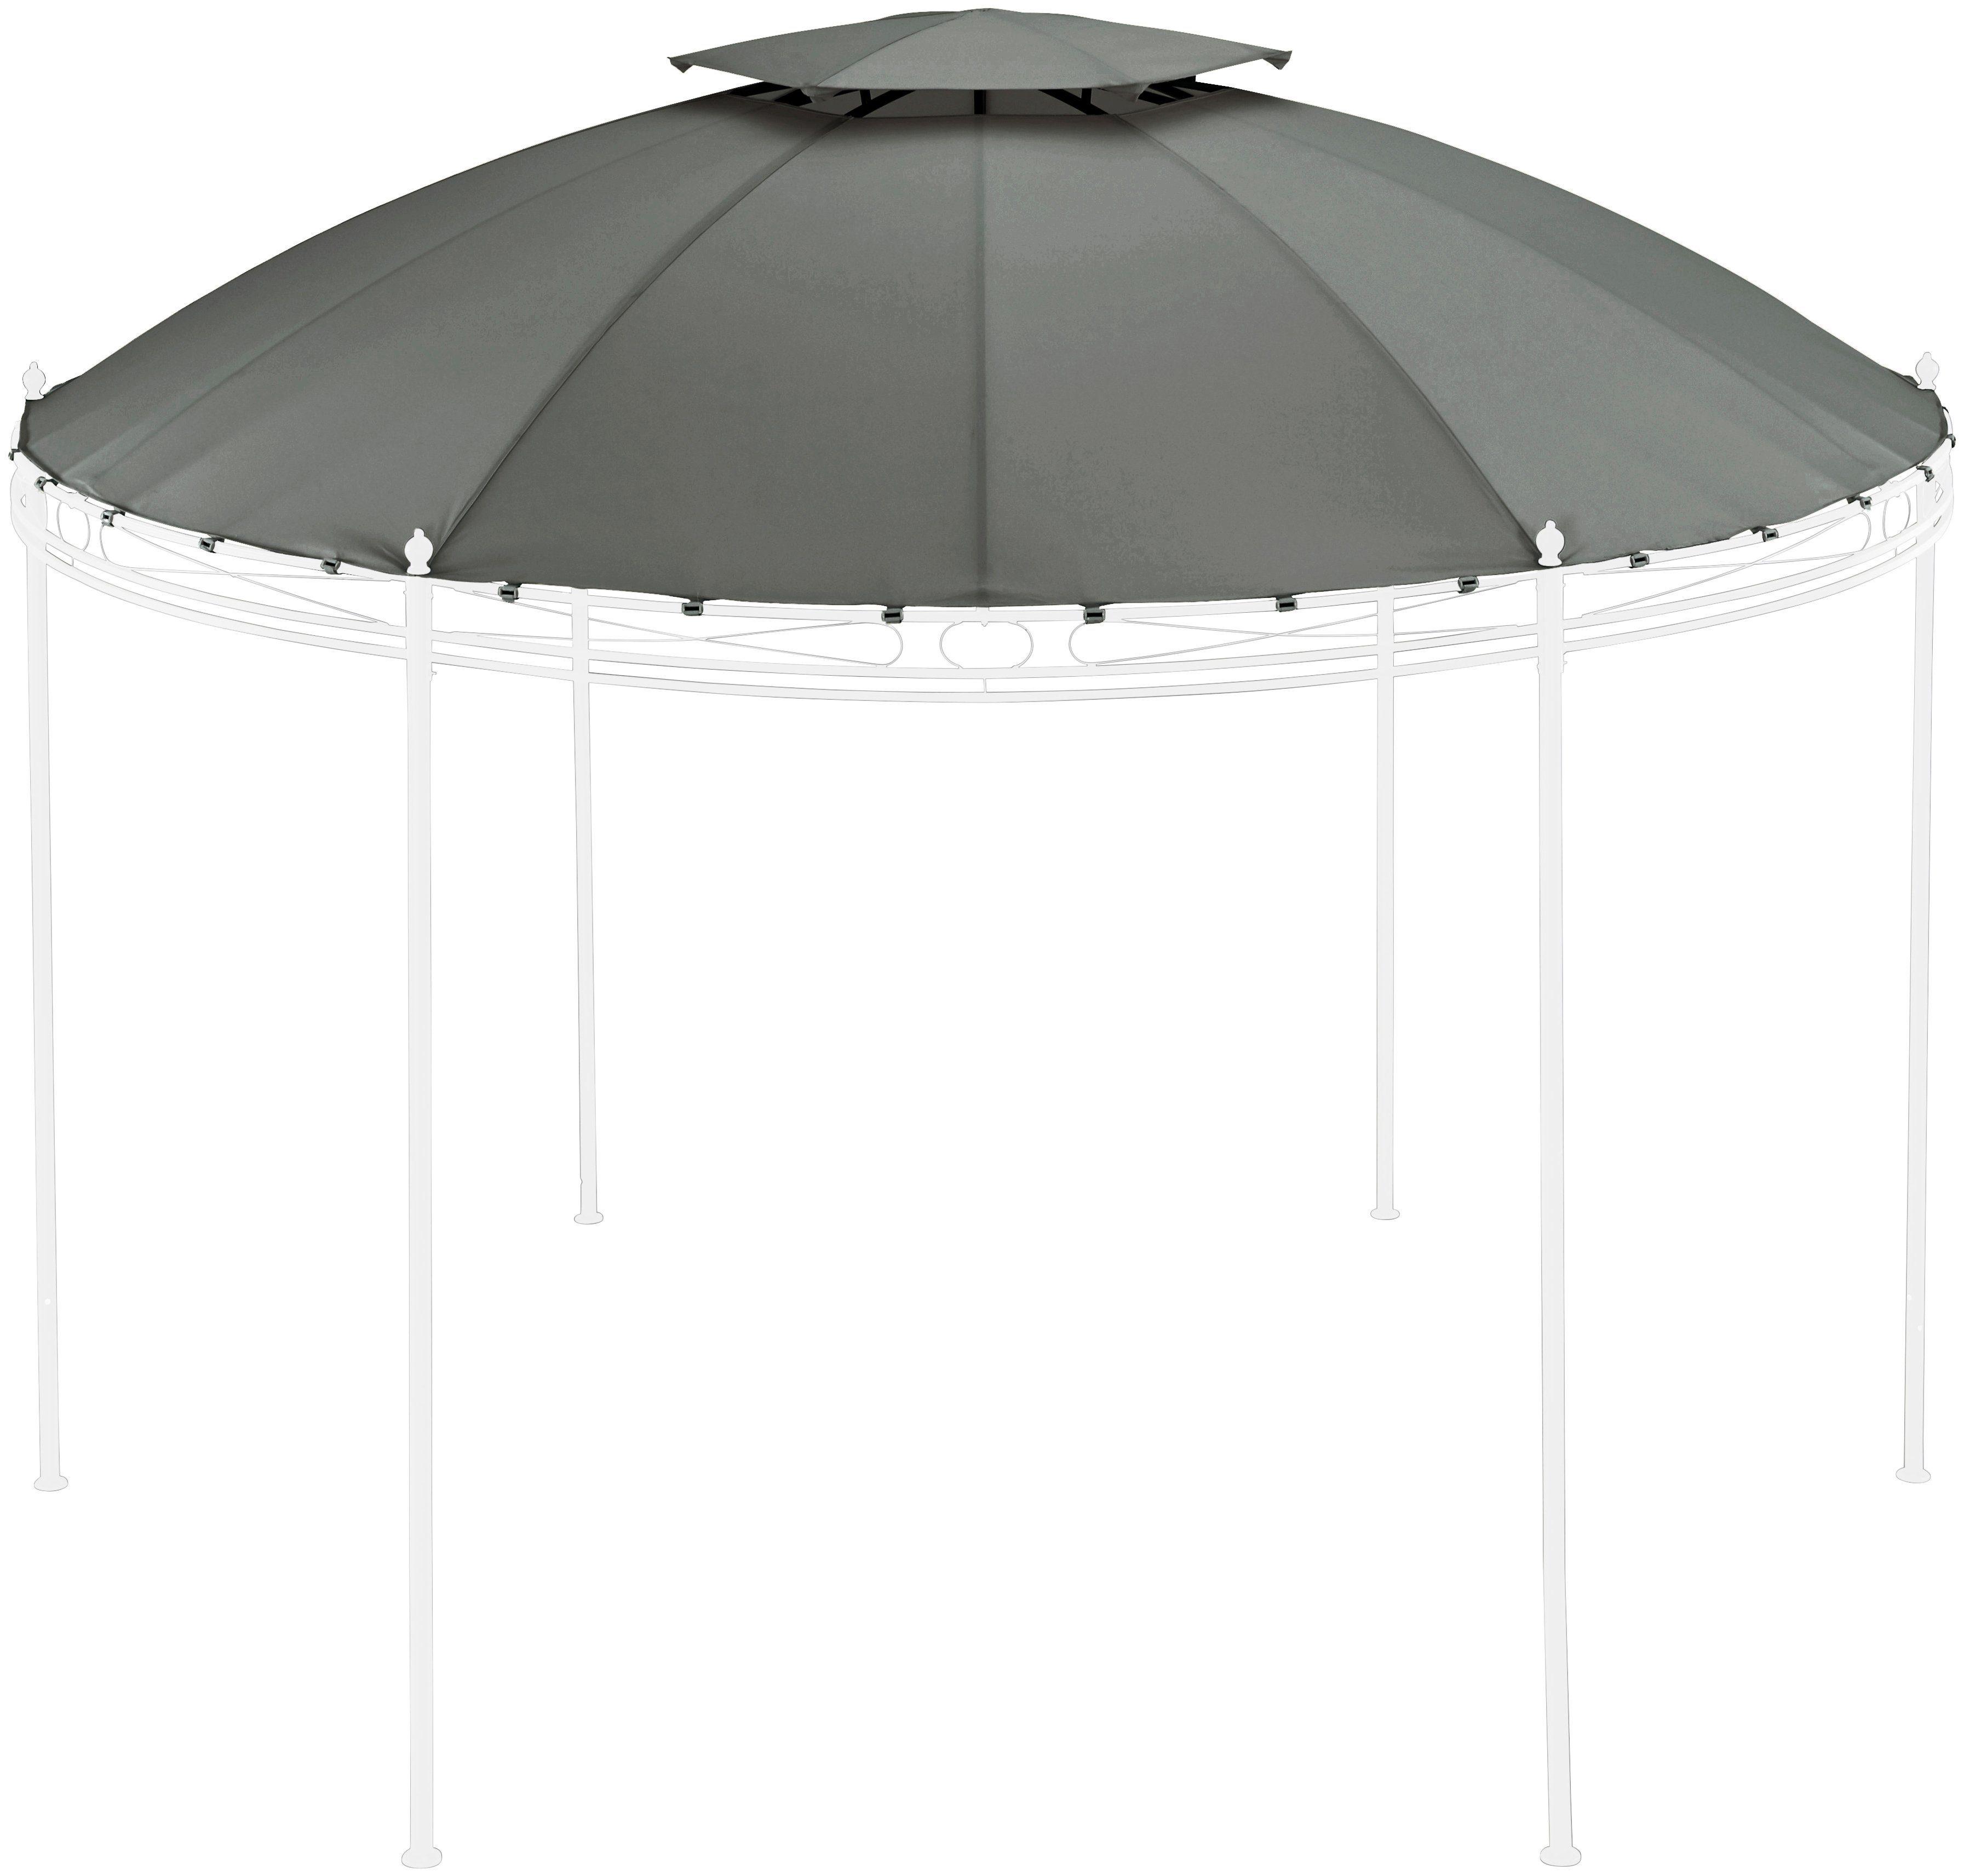 Ersatzdach für Pavillon »Tino 1«, 350 x 350 cm, grau